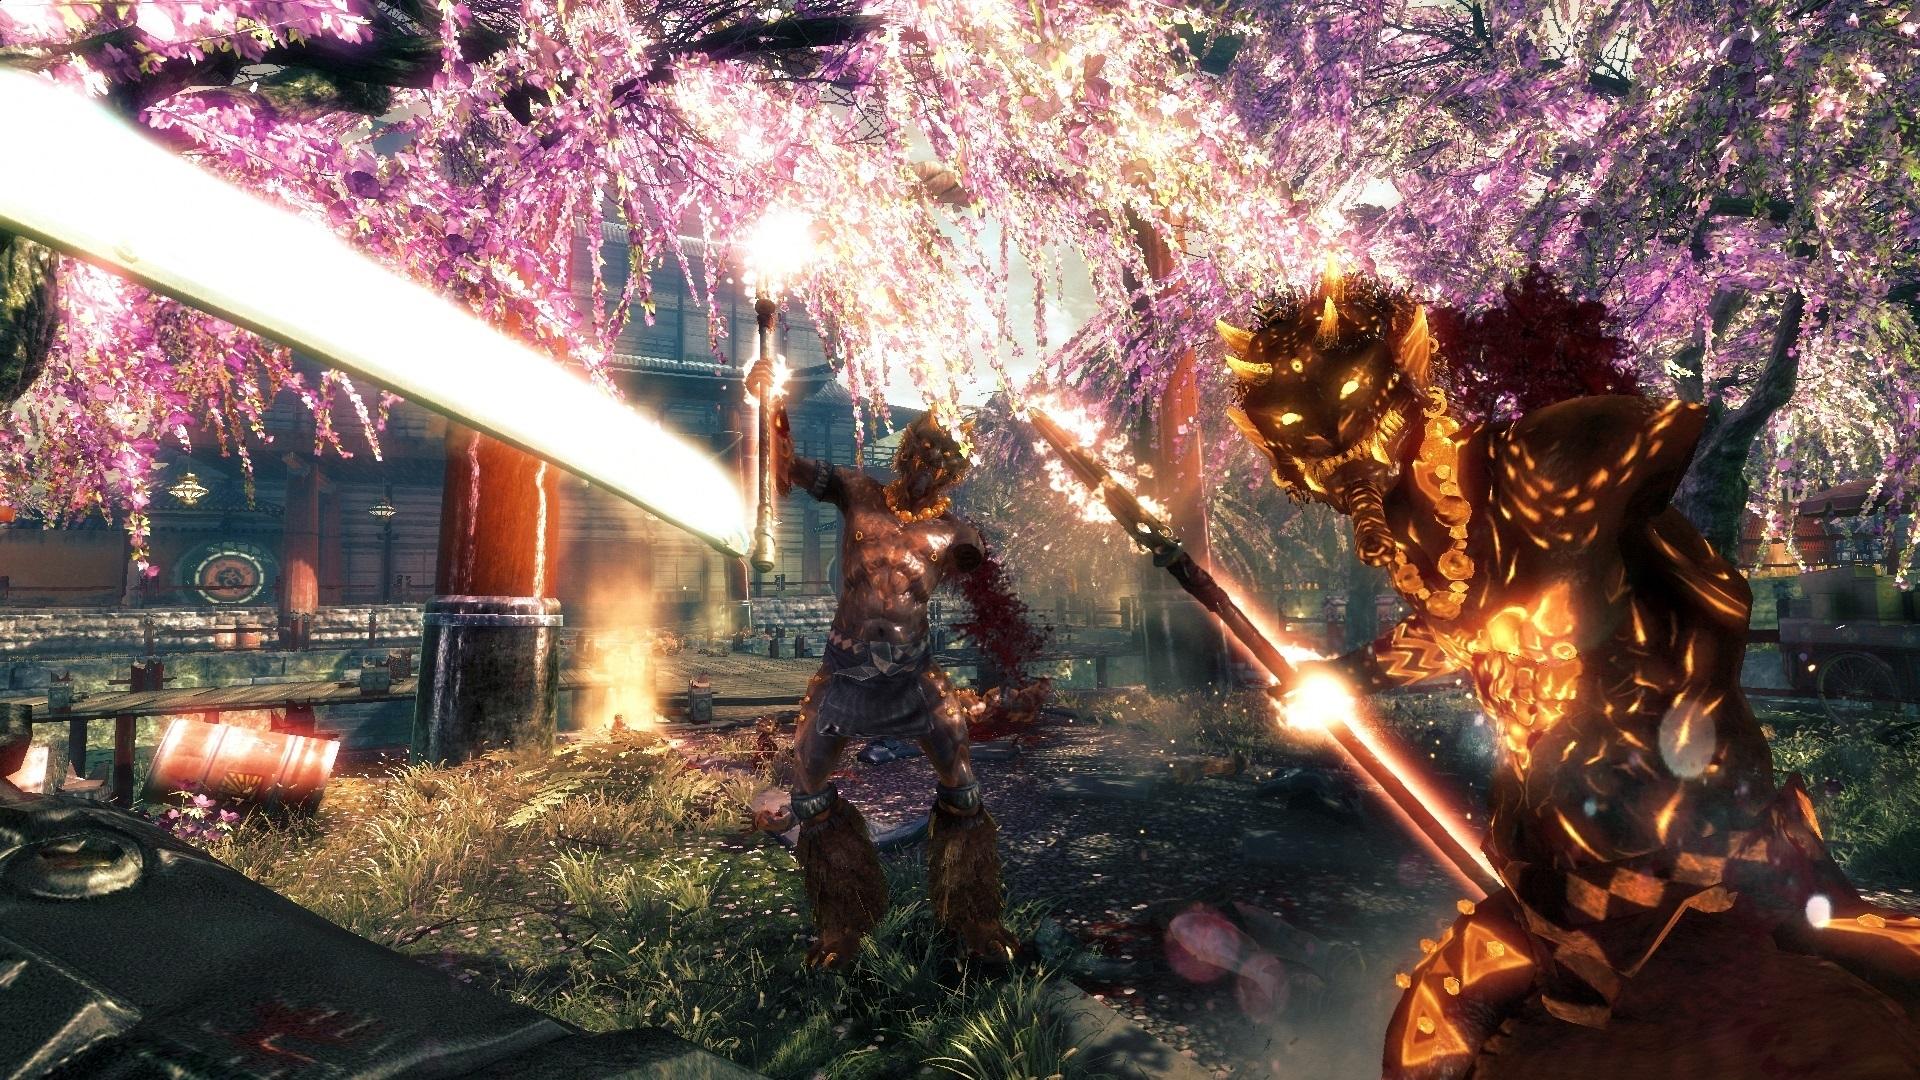 shadow-warrior-2013-pc-screenshot-1